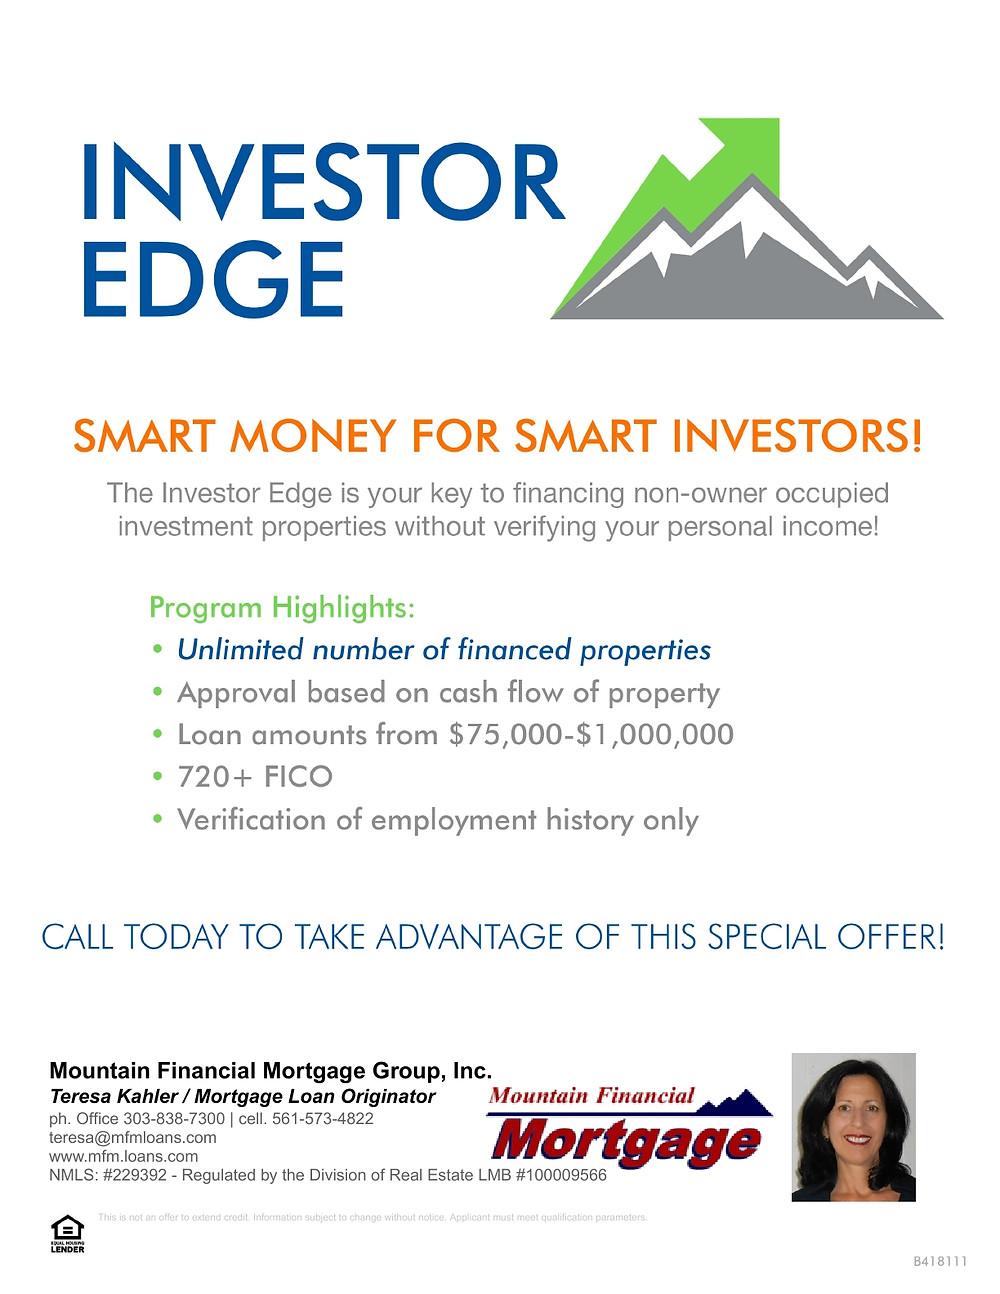 Investors Edge Mountain Financial Mortgage.jpg